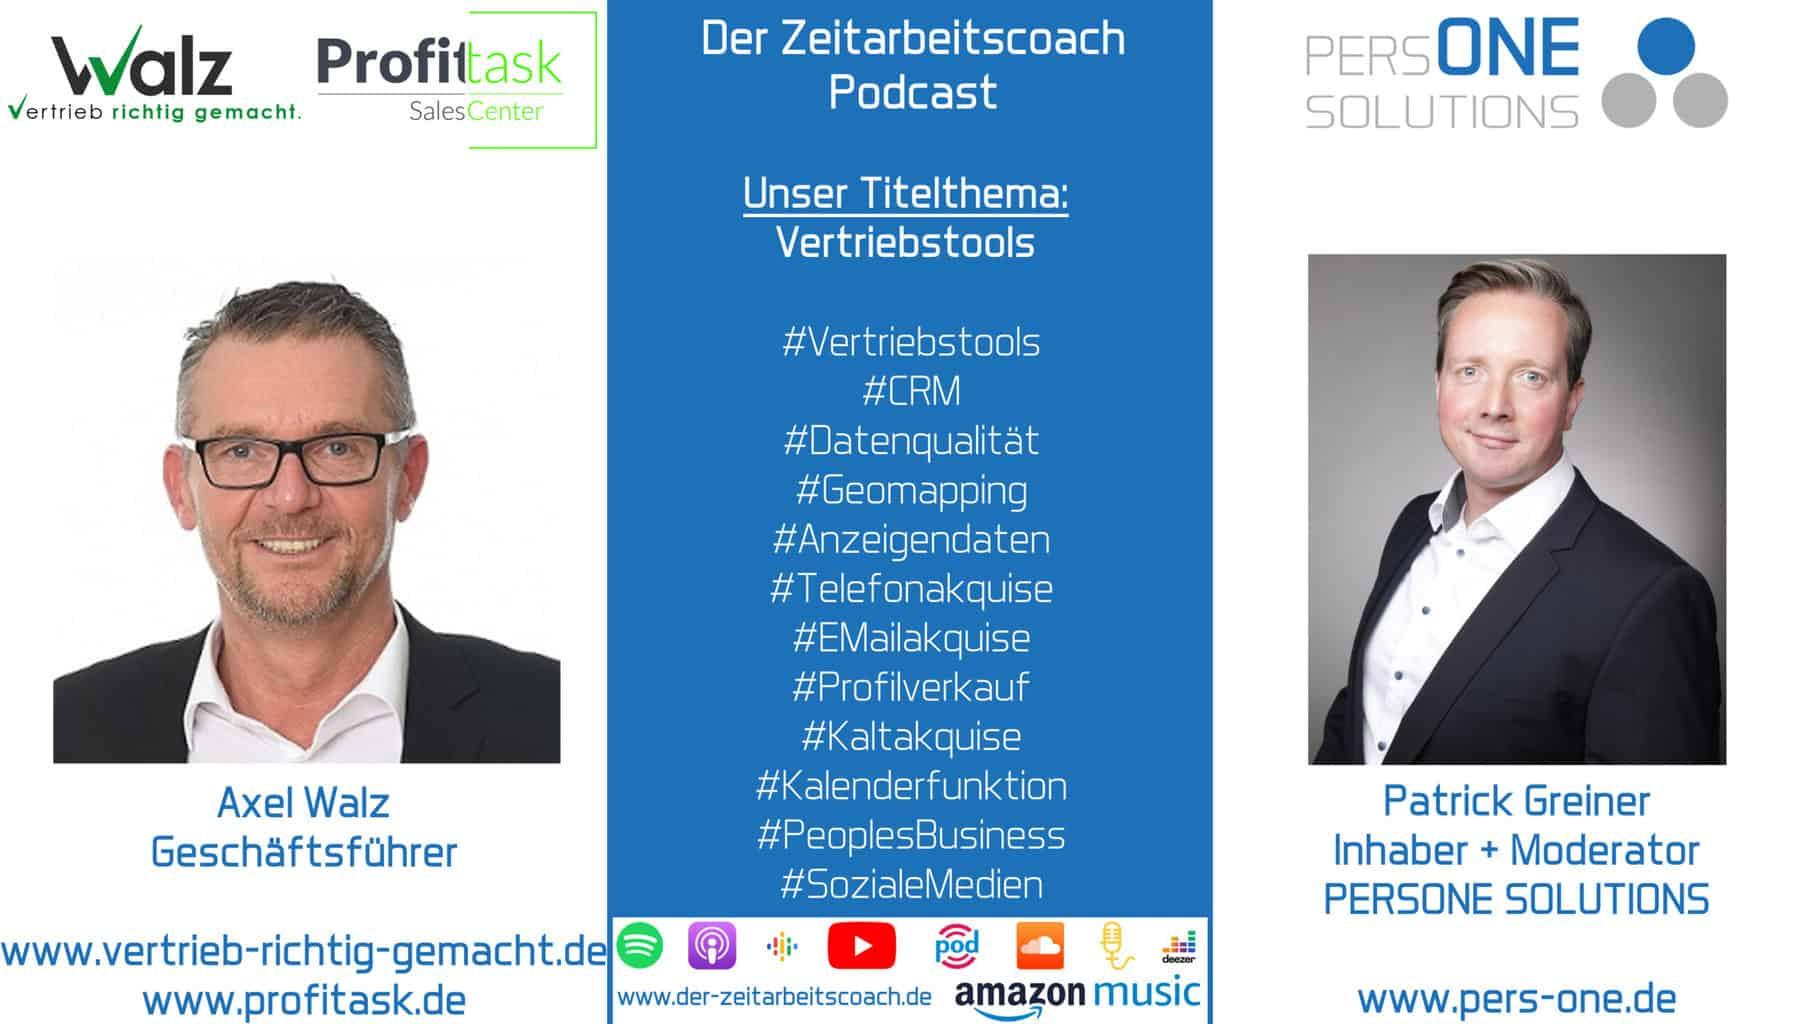 Walz, Axel_2-4_Podcast YT Grafik-Interview_Zeitarbeitscoach-Podcast